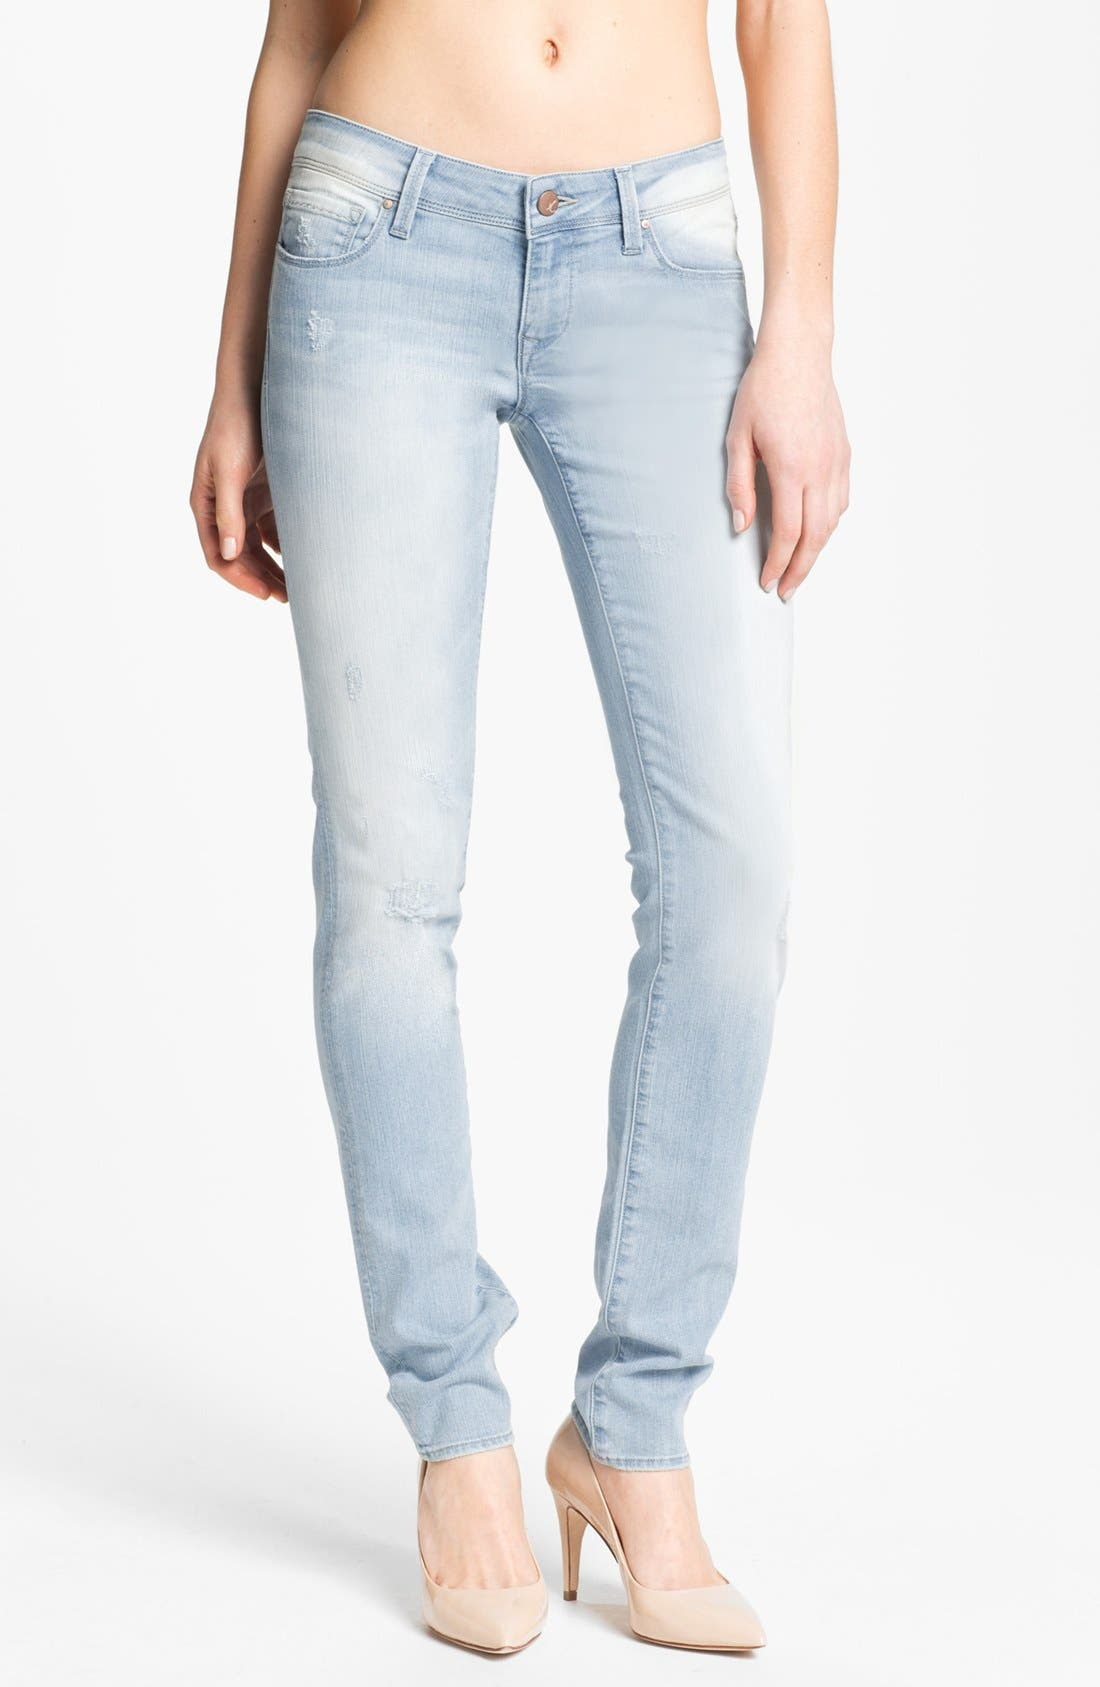 Alternate Image 1 Selected - Mavi Jeans 'Serena' Low Rise Super Skinny Jeans (Bleached Nolita)